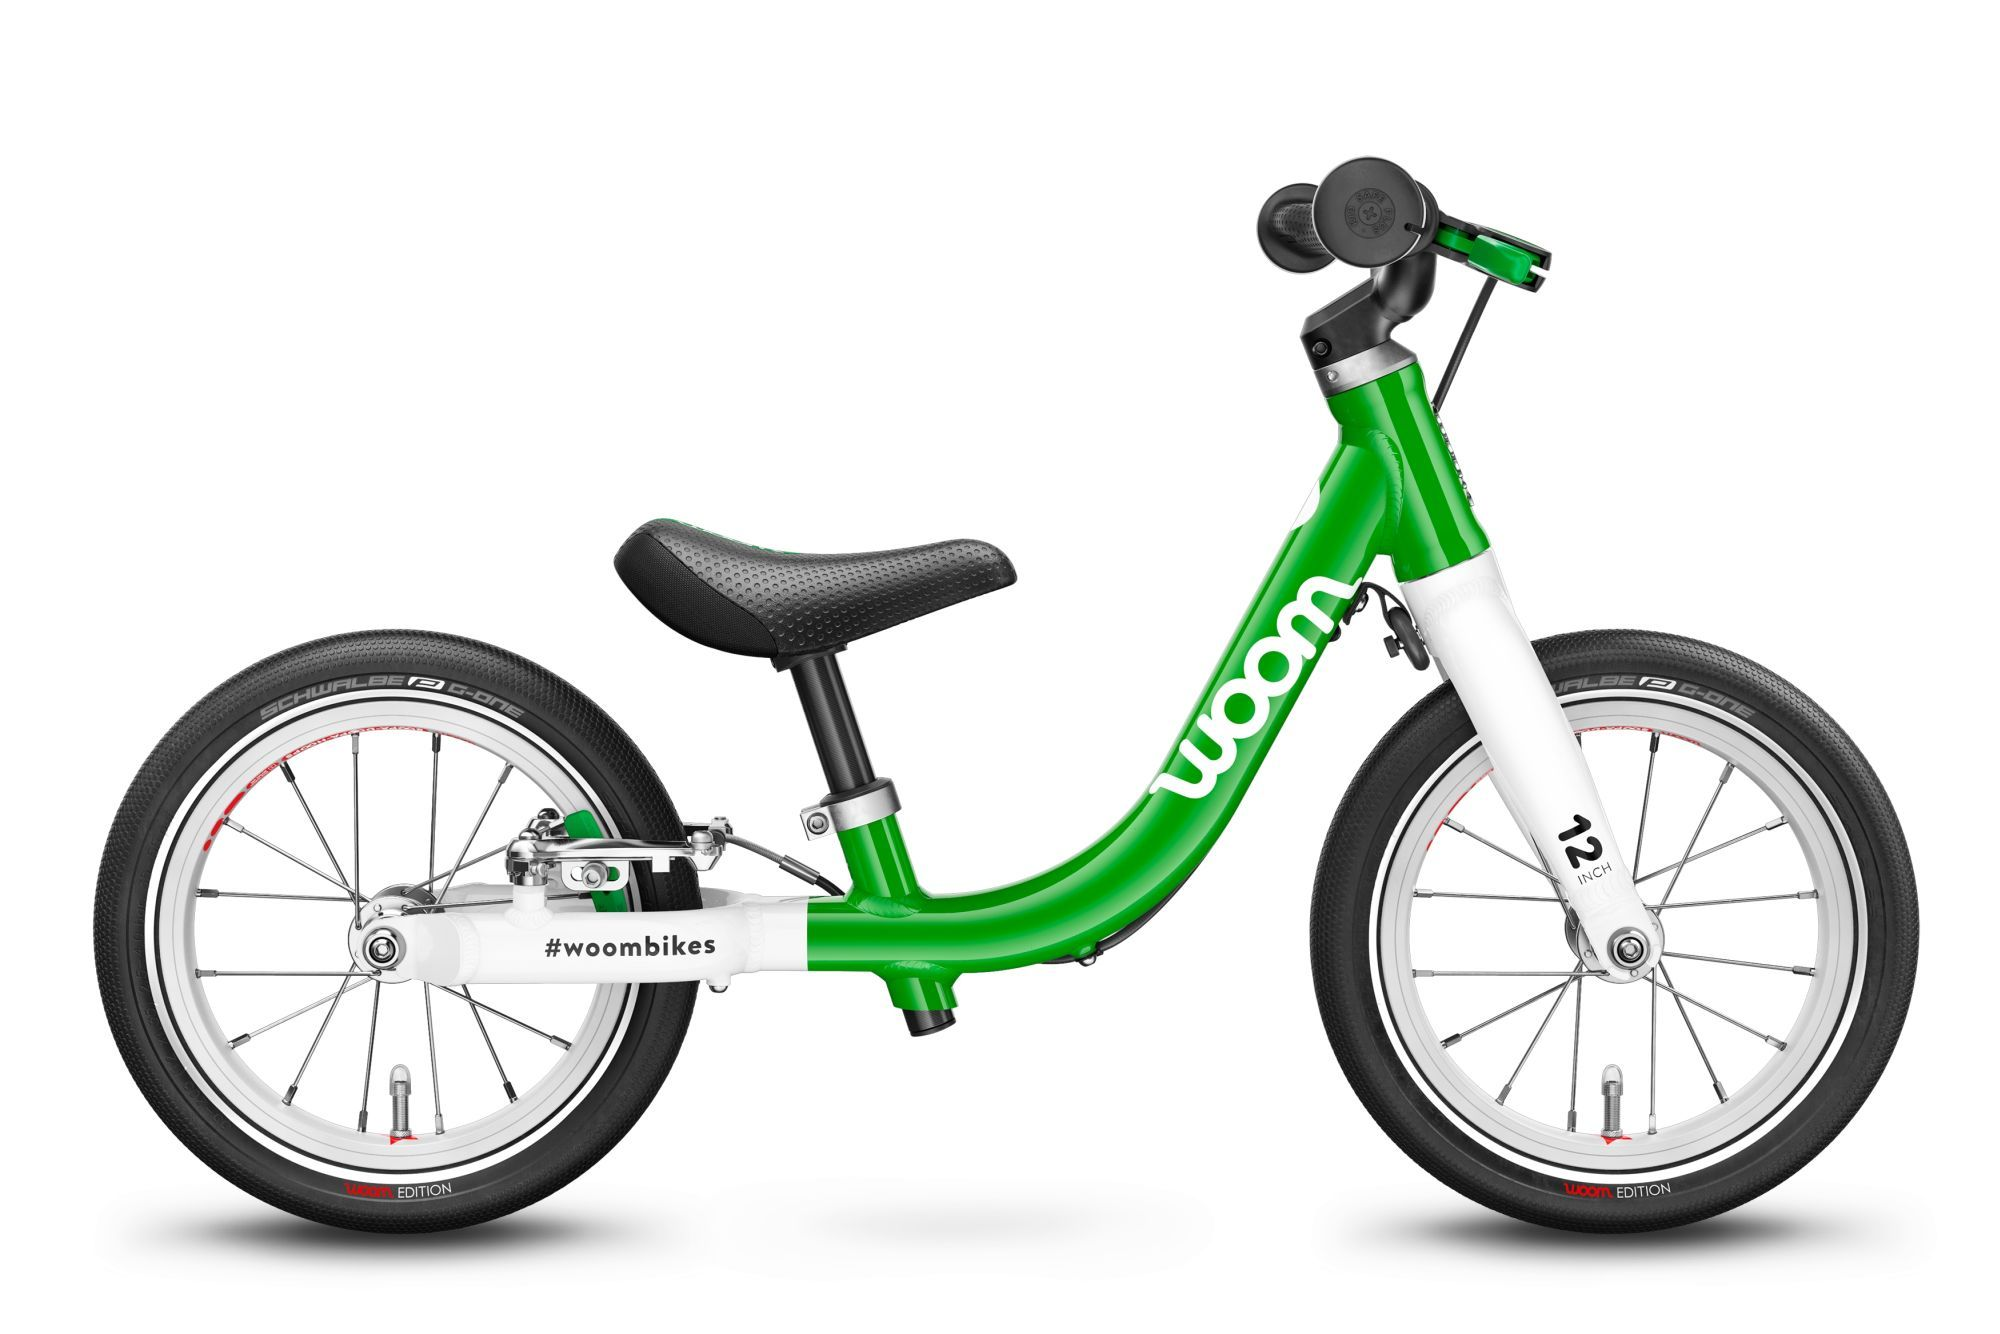 kinderfahrzeuge & laufräder: WOOM Woom 1 1 Gang Kinderlaufrad Wave Modell 2021 12 Zoll